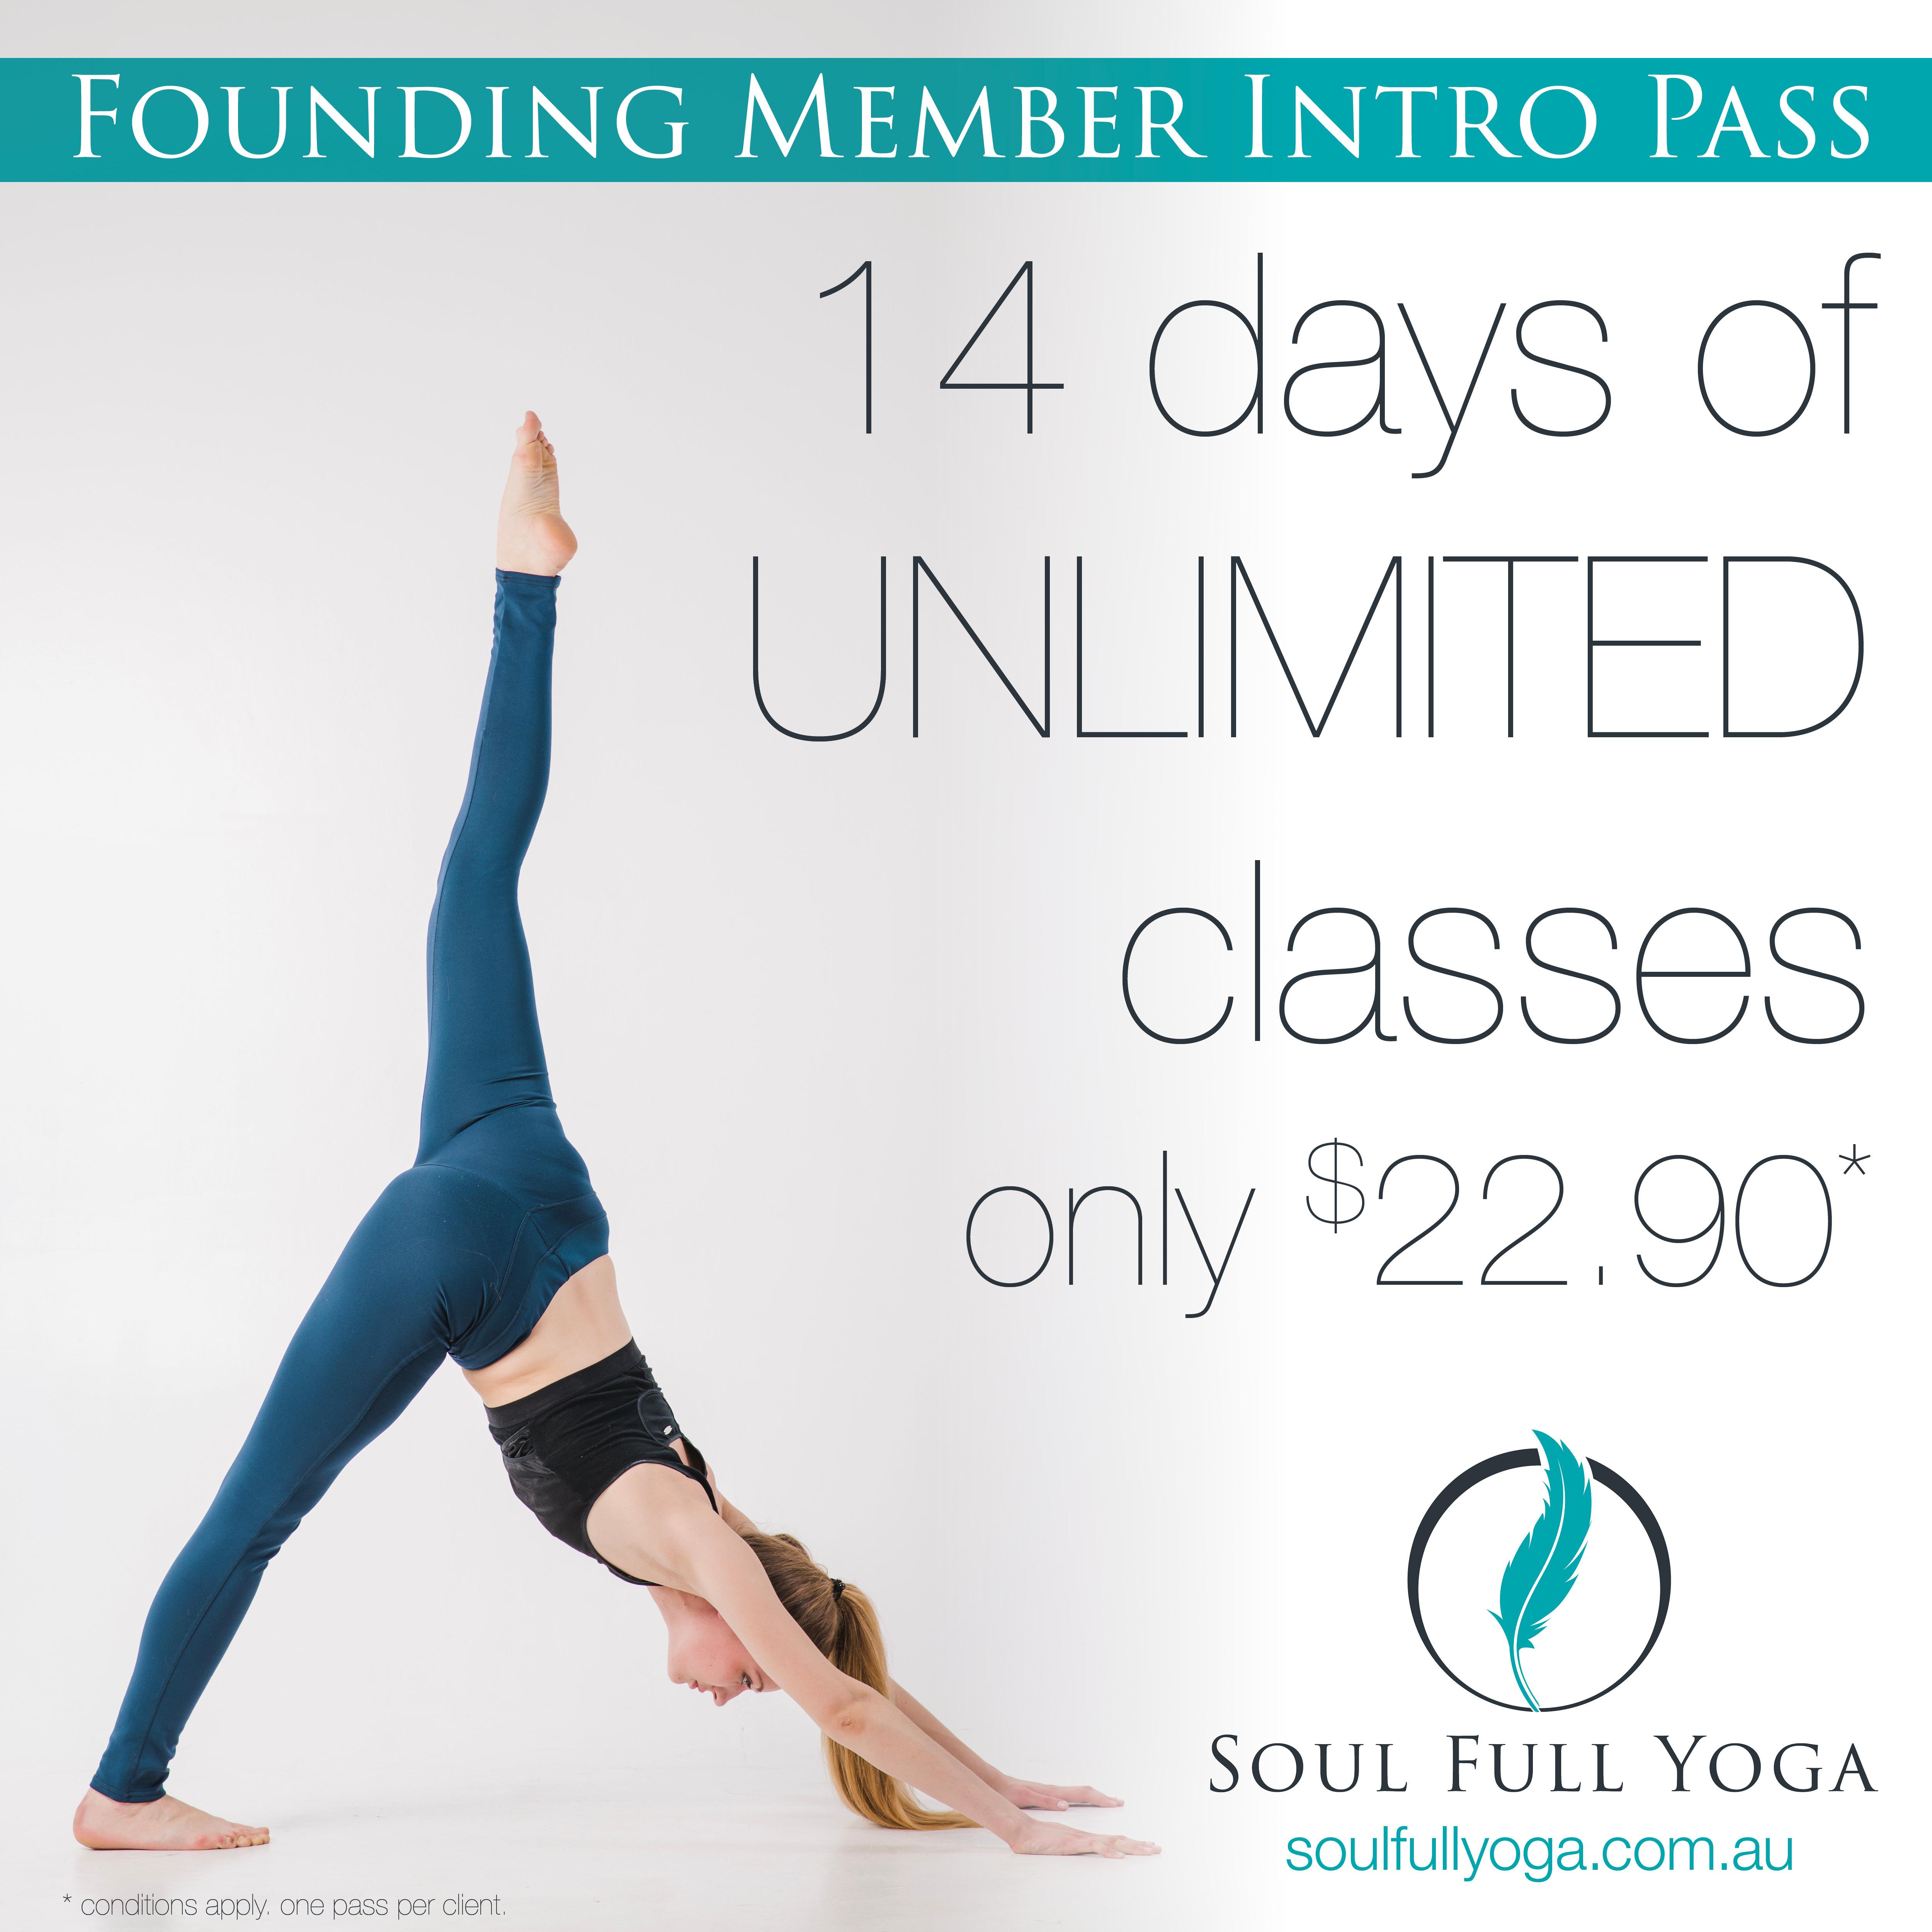 Soul Full Yoga